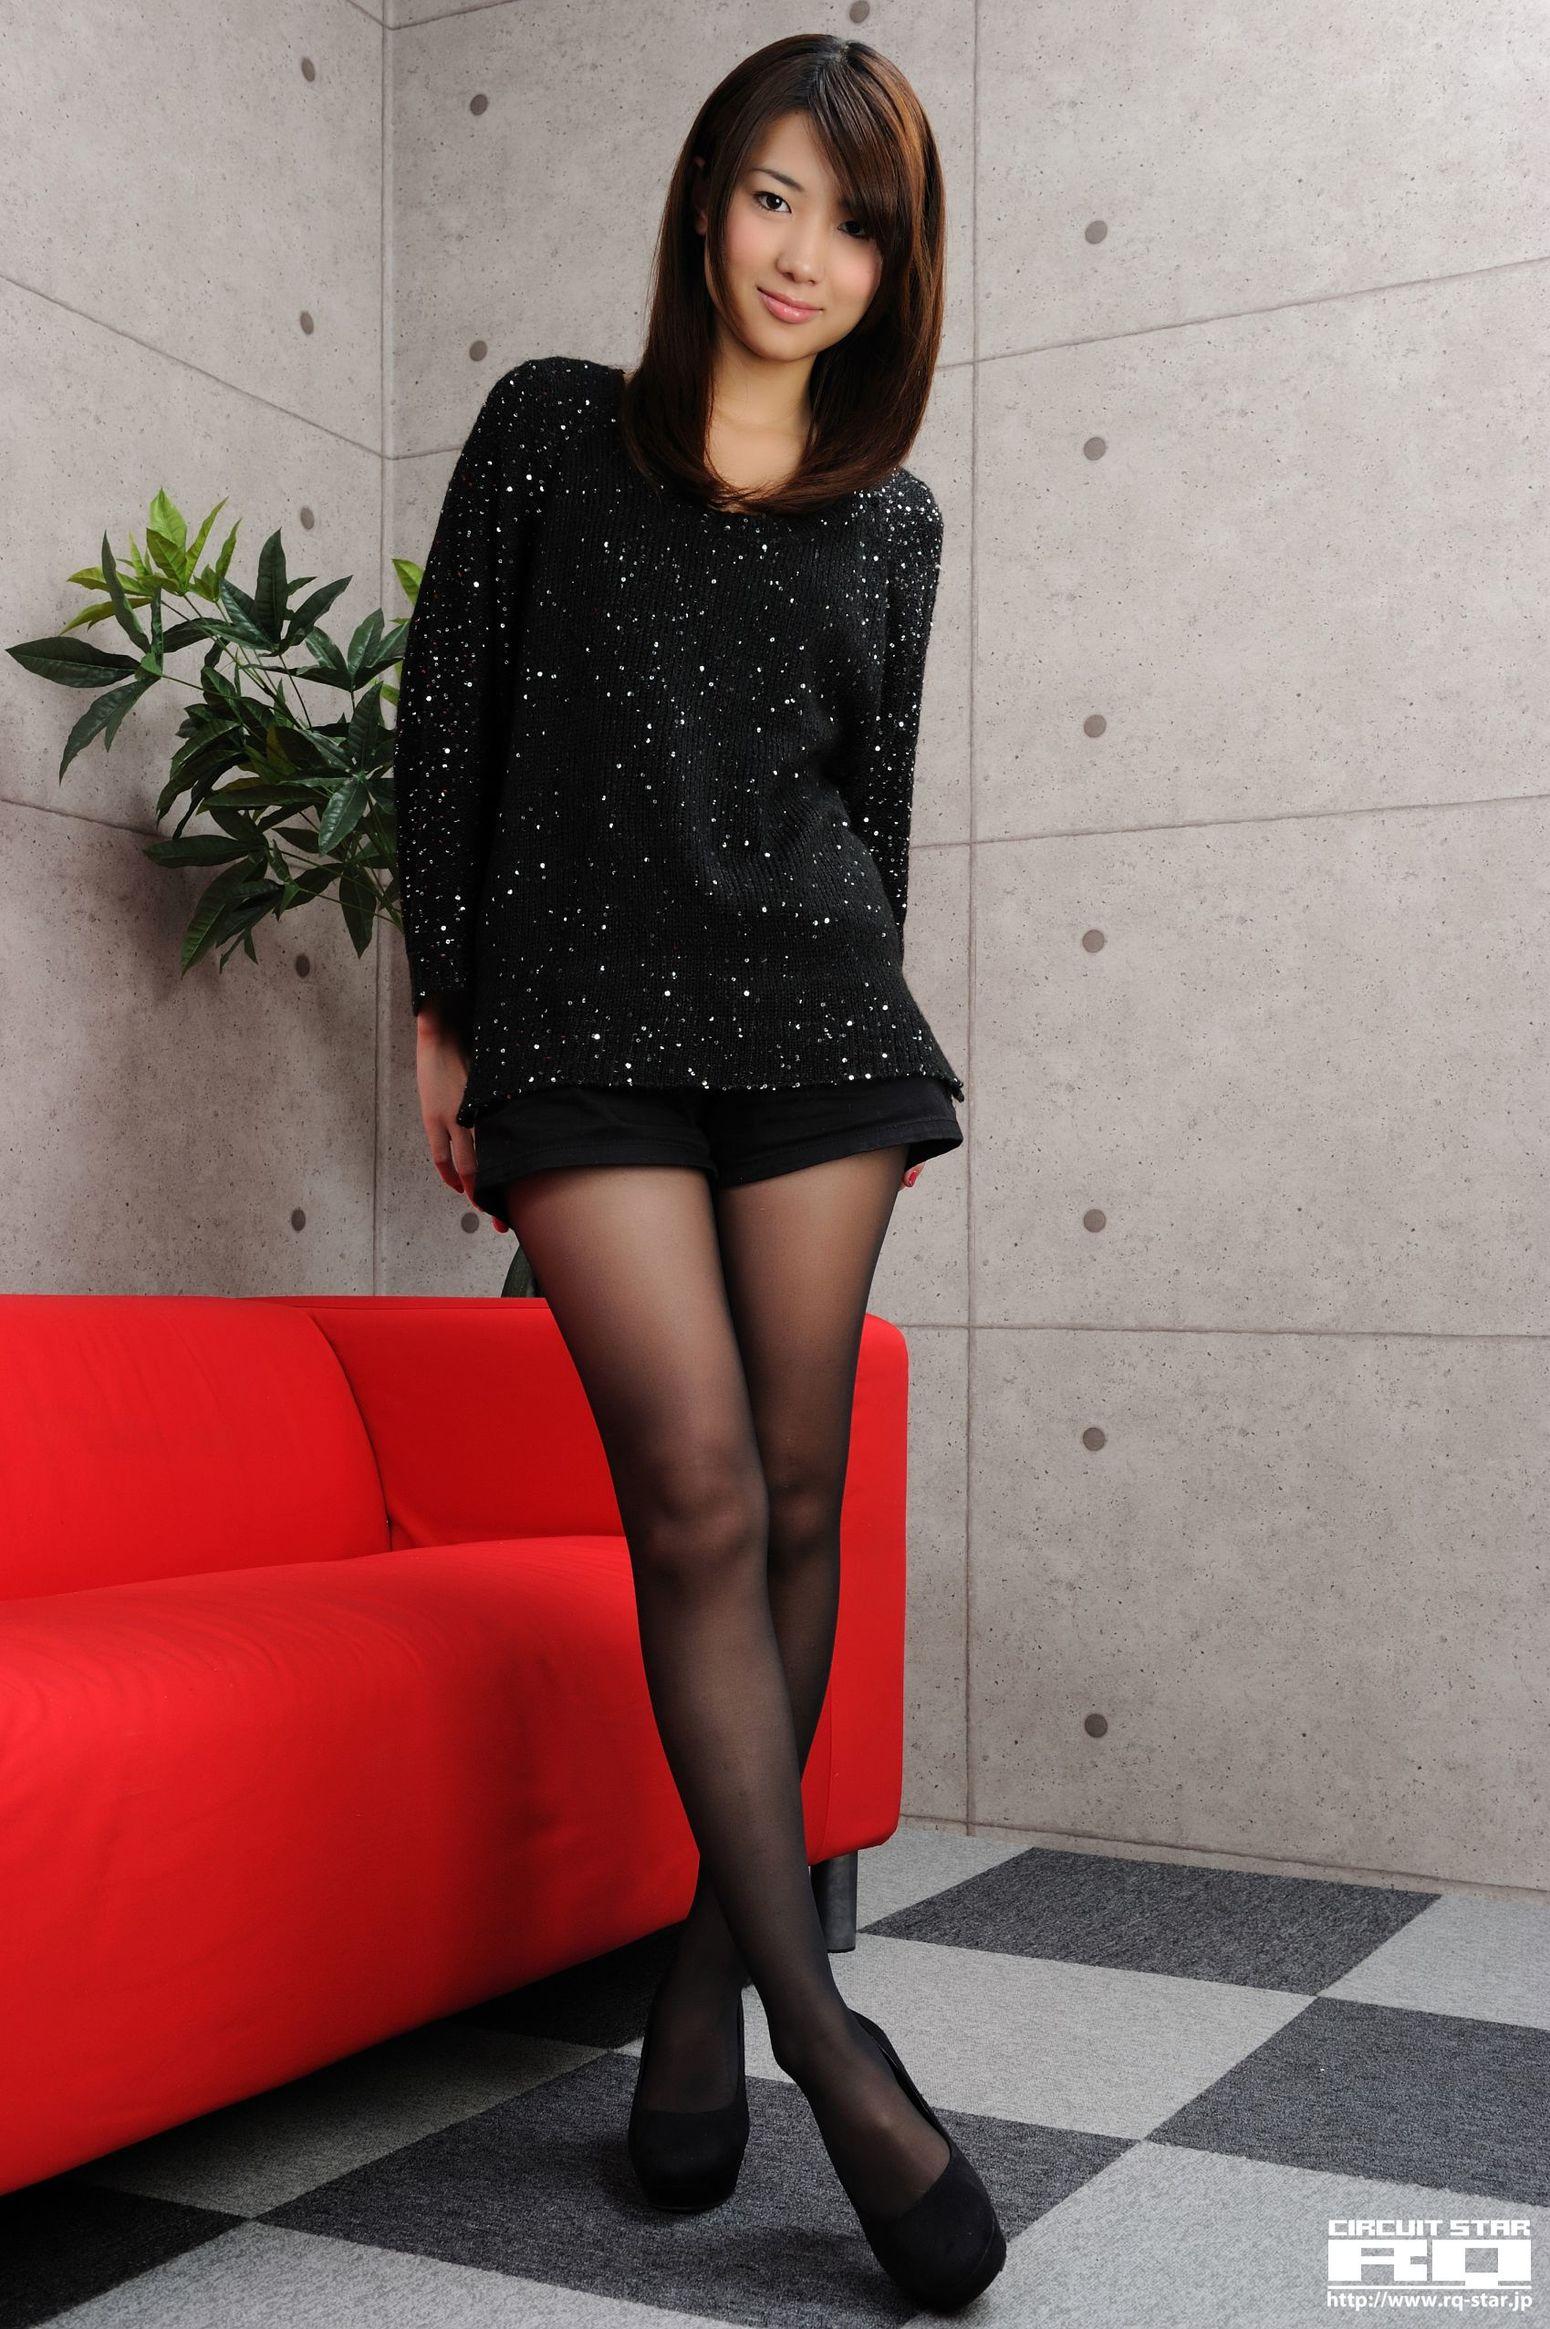 [RQ-STAR] NO.00577 Naoho Ichihashi 市橋直歩 Private Dress 写真集1